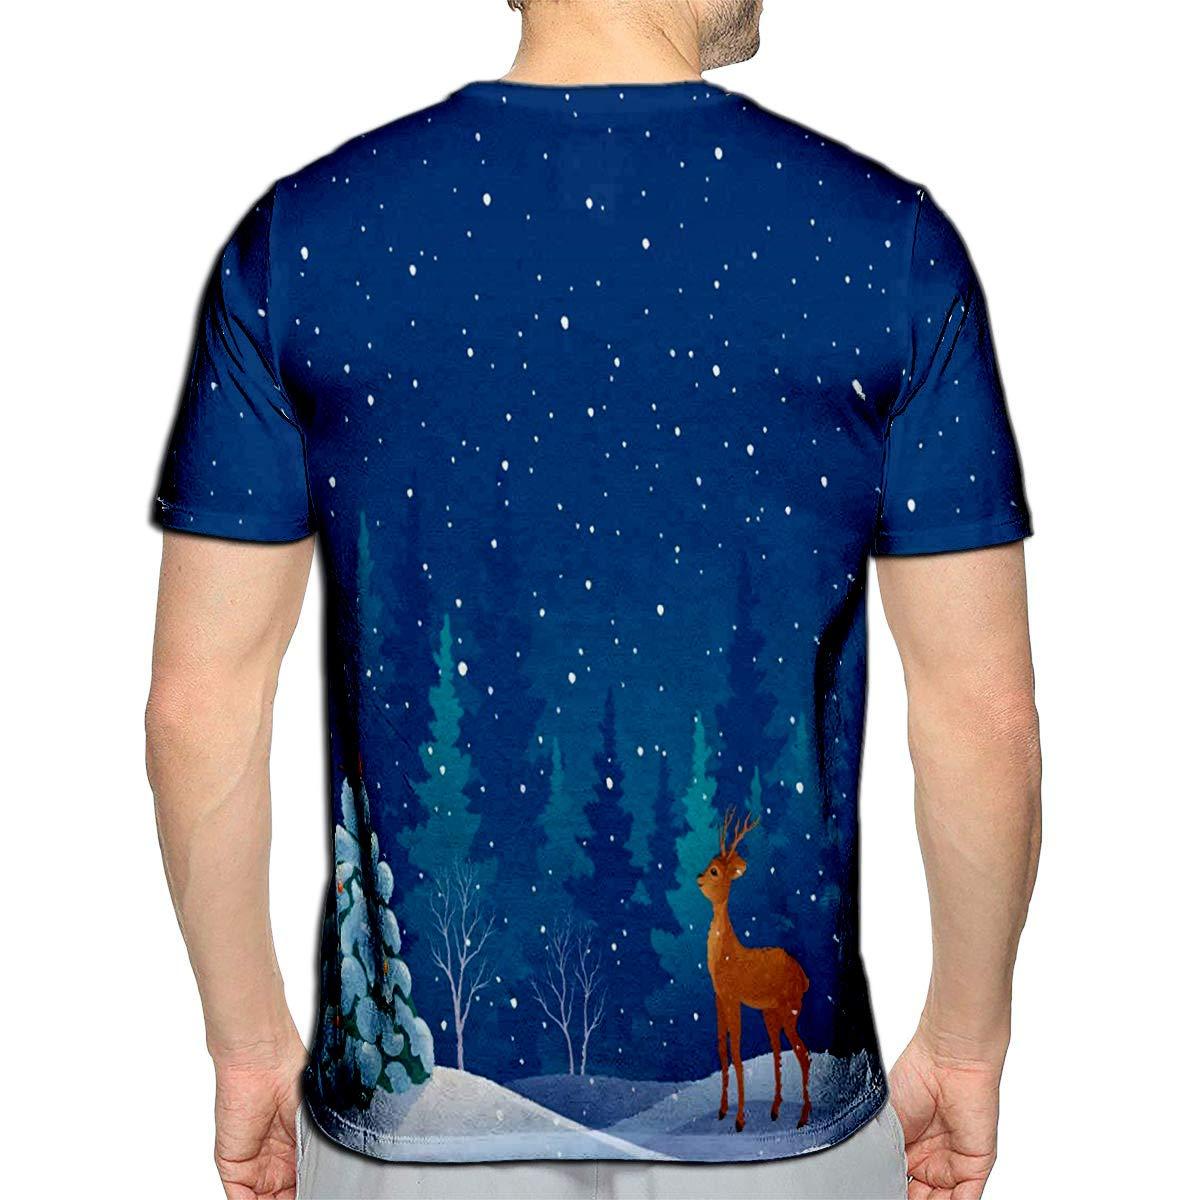 Randell 3D Printed T-Shirts Color Sketch of The Dog Basset Hound Breed Sitting Short SLE